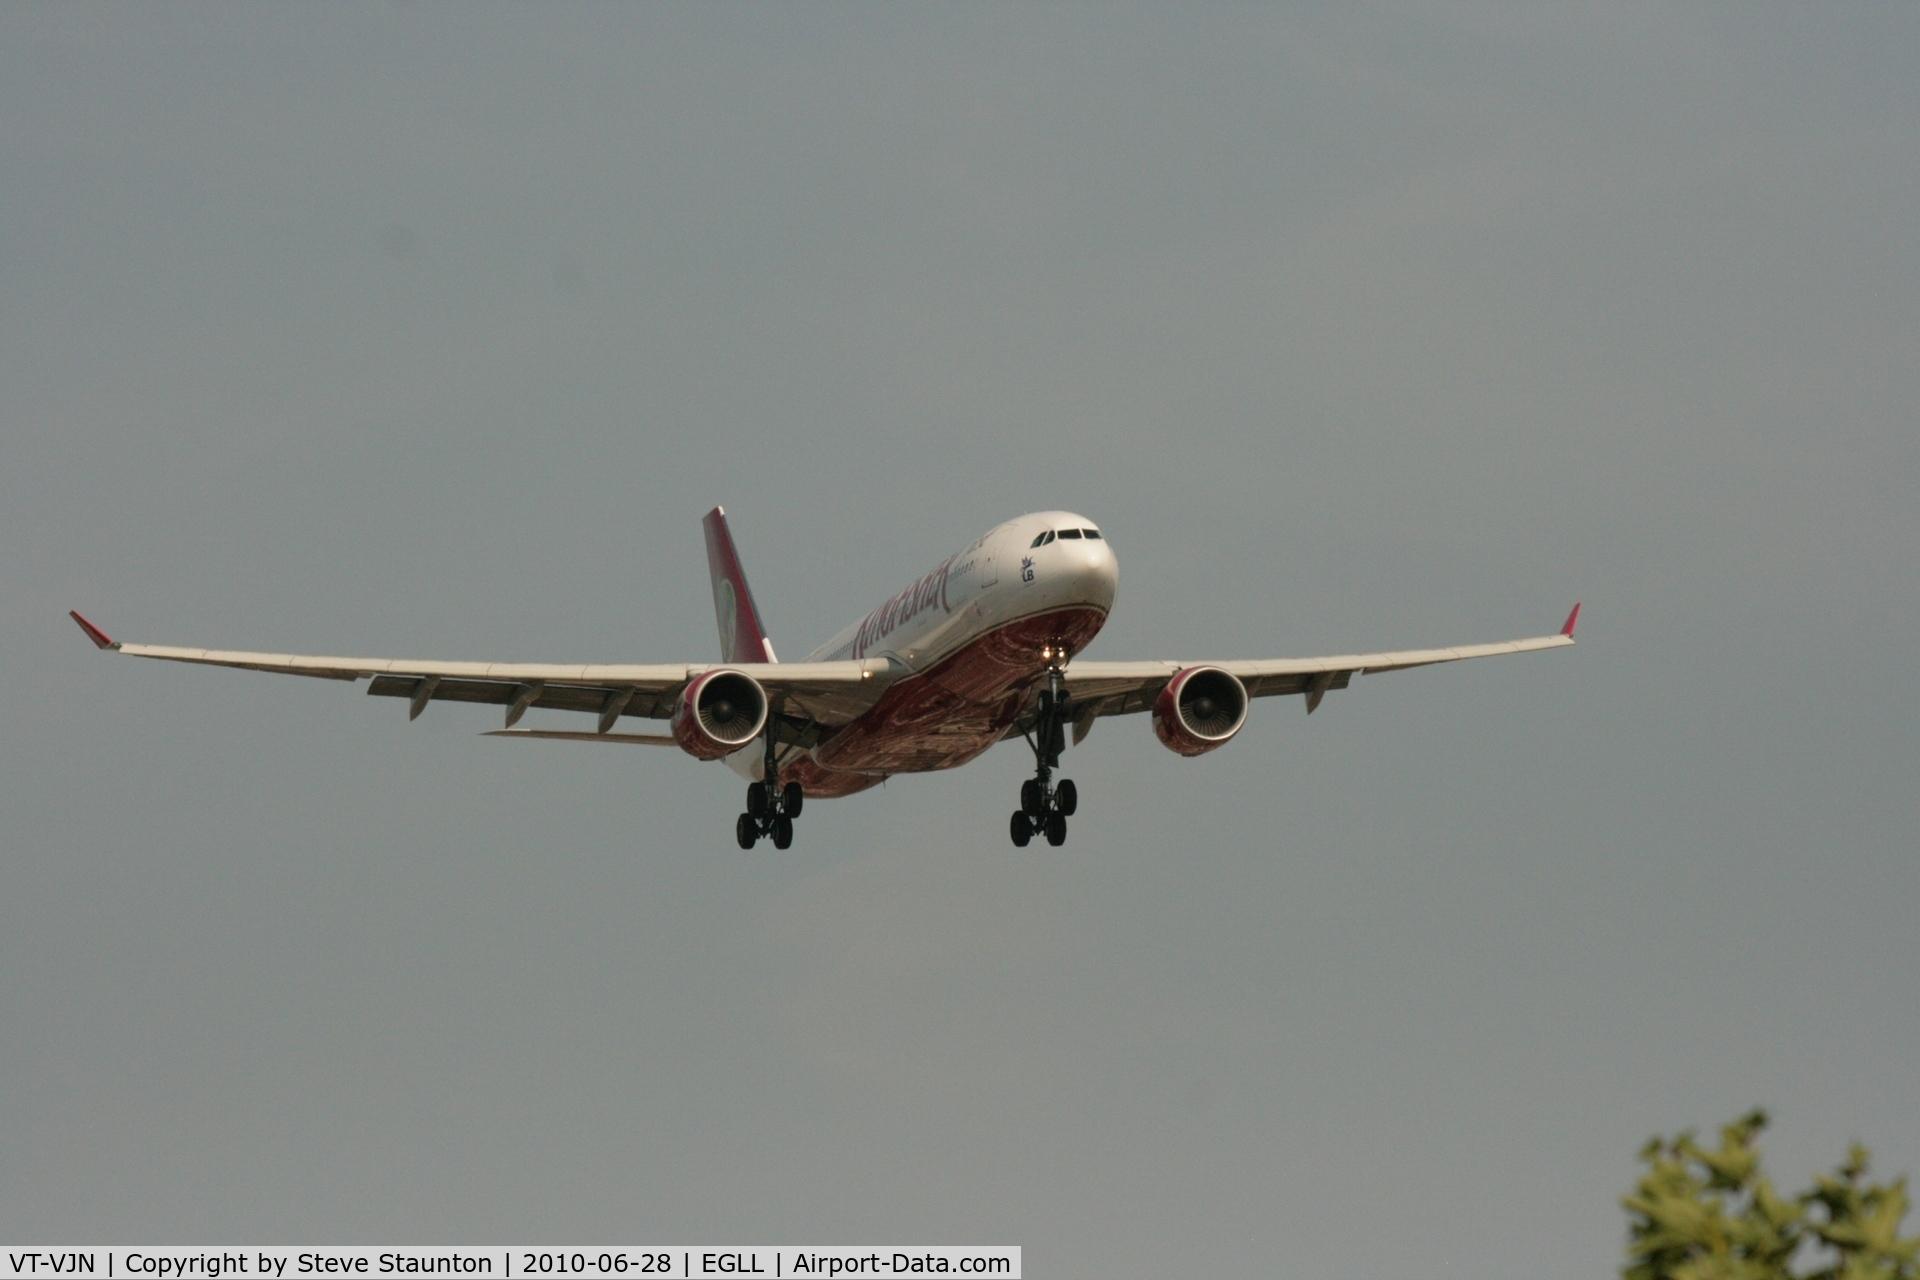 VT-VJN, 2008 Airbus A330-223 C/N 927, Taken at Heathrow Airport, June 2010